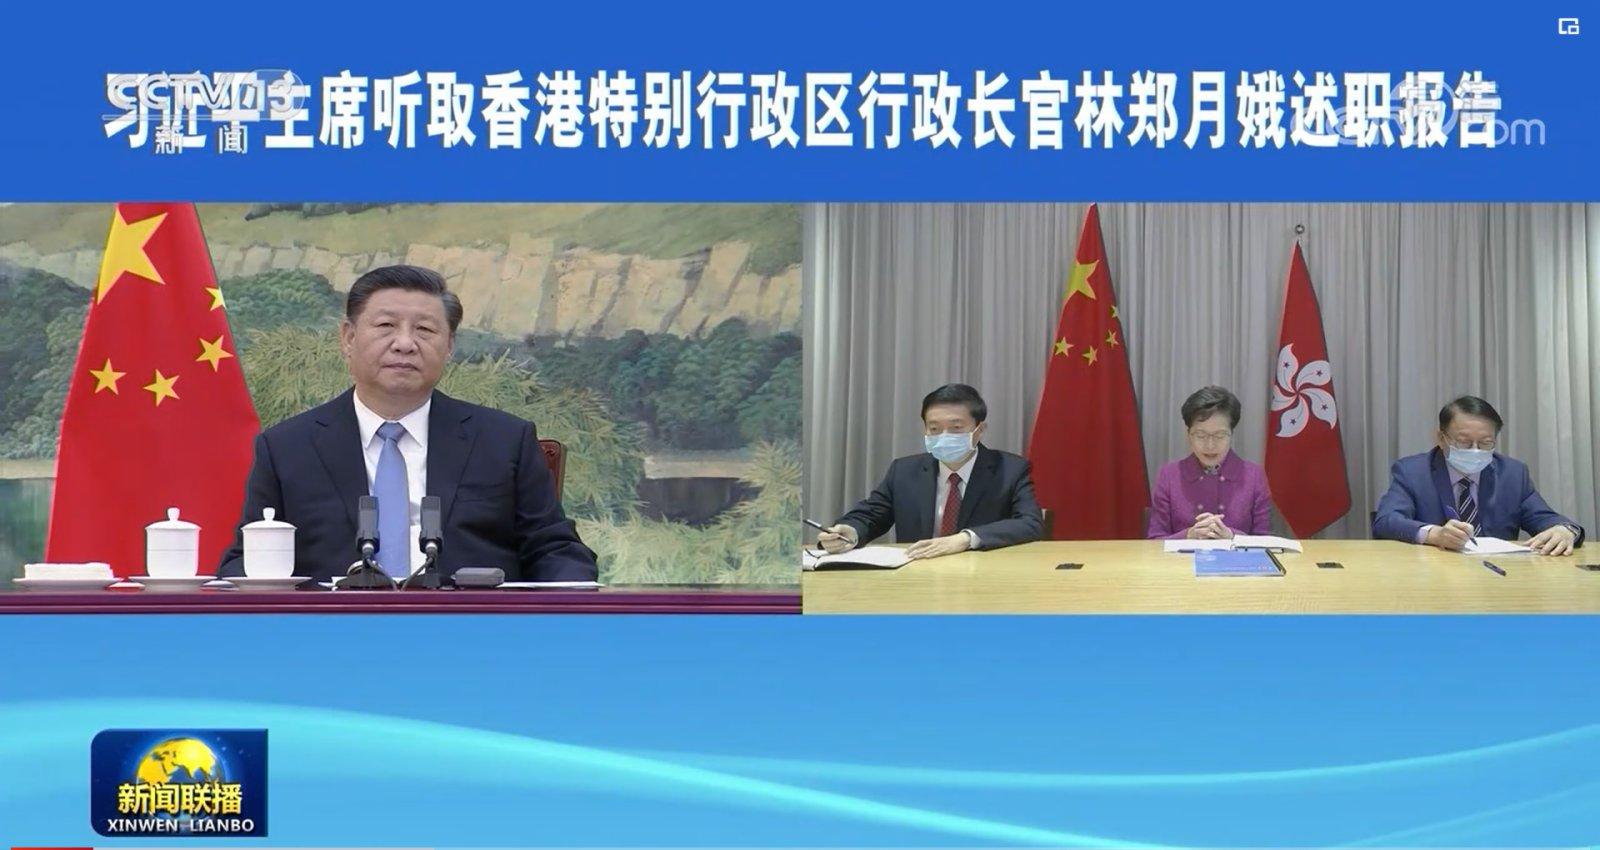 Image result for 2021年1月27日,國家主席習近平在聽取林鄭月娥述職